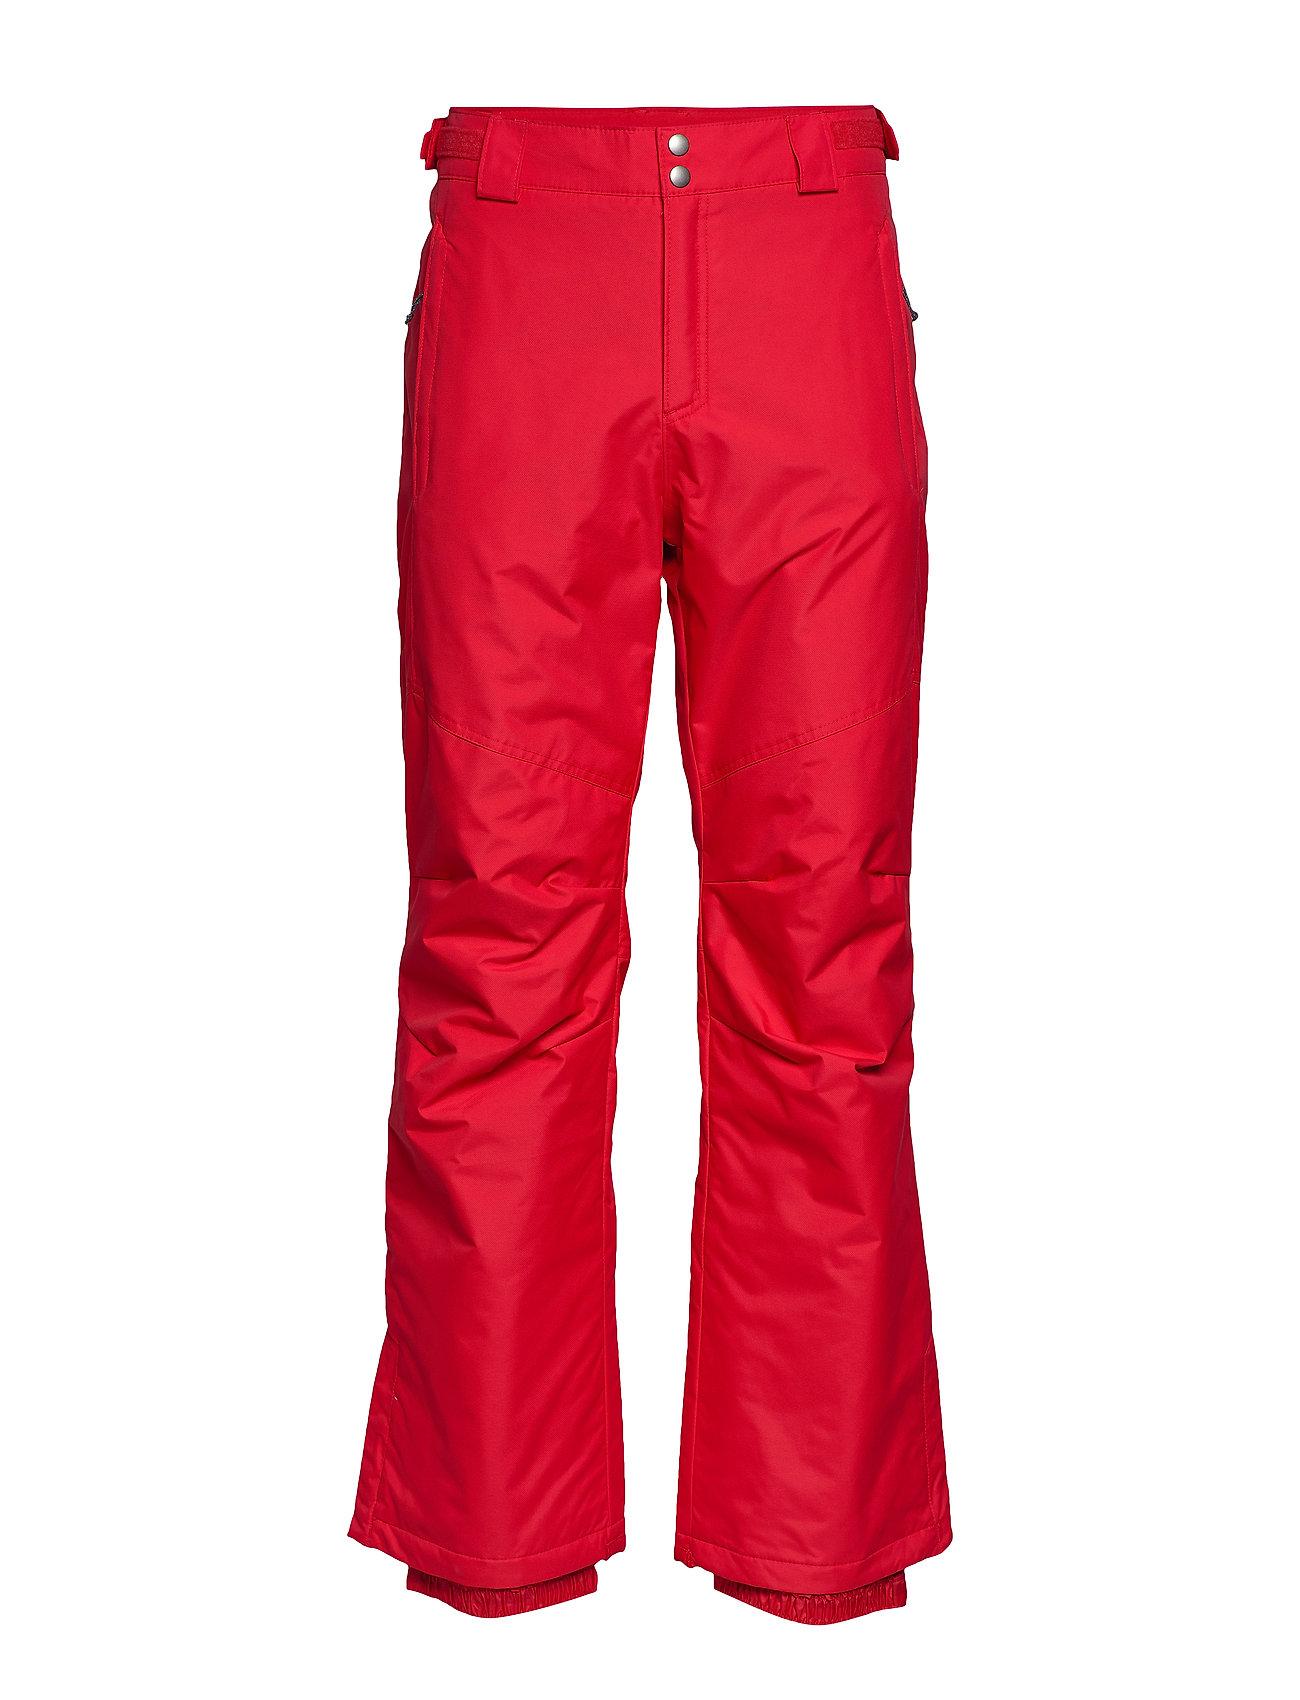 Image of Bugaboo Iv Pant Sport Pants Rød Columbia (3254424237)